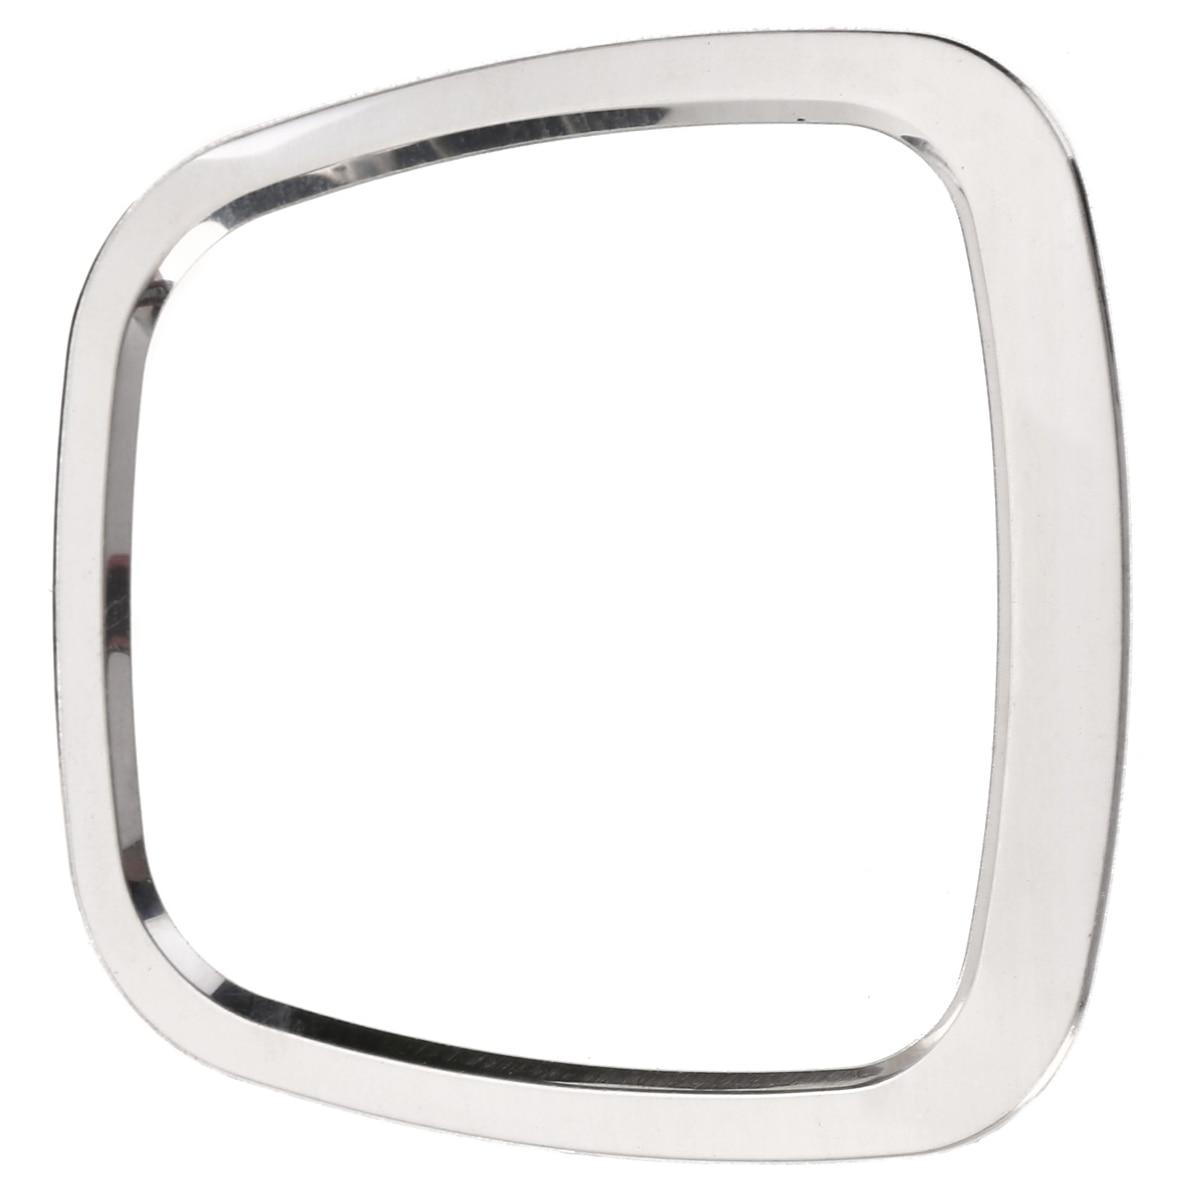 Car Steering Wheel Centre Ring Steering Wheel Cover Trim Aluminium Chromium alloy Decoration Frame Trim for A1 A3 A4 A5 A6 Q3 Q5 Red